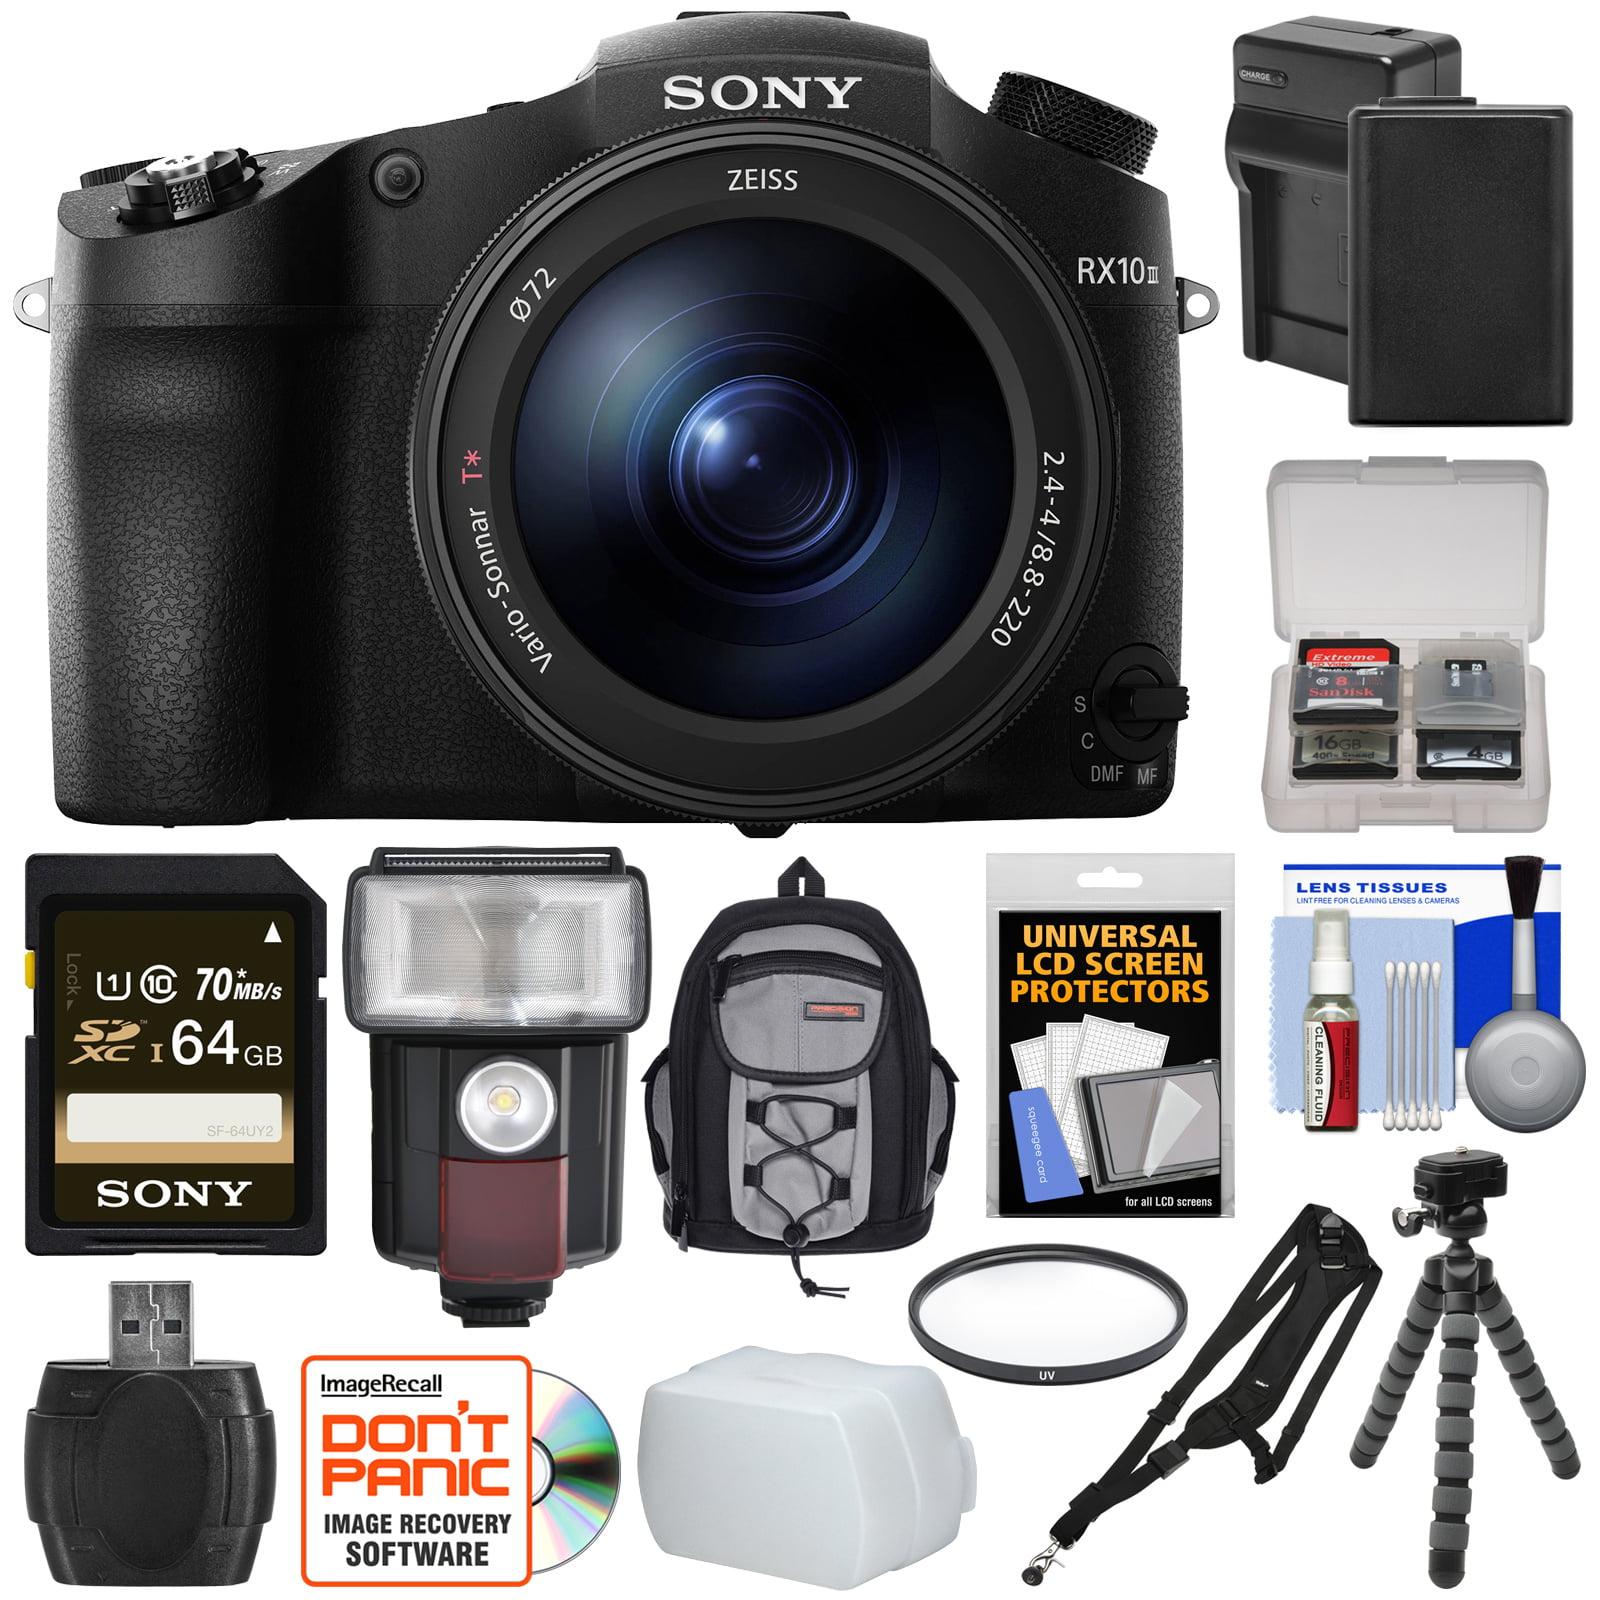 Sony Cyber Shot Dsc Rx10 Iii 4k Wi Fi Digital Camera With